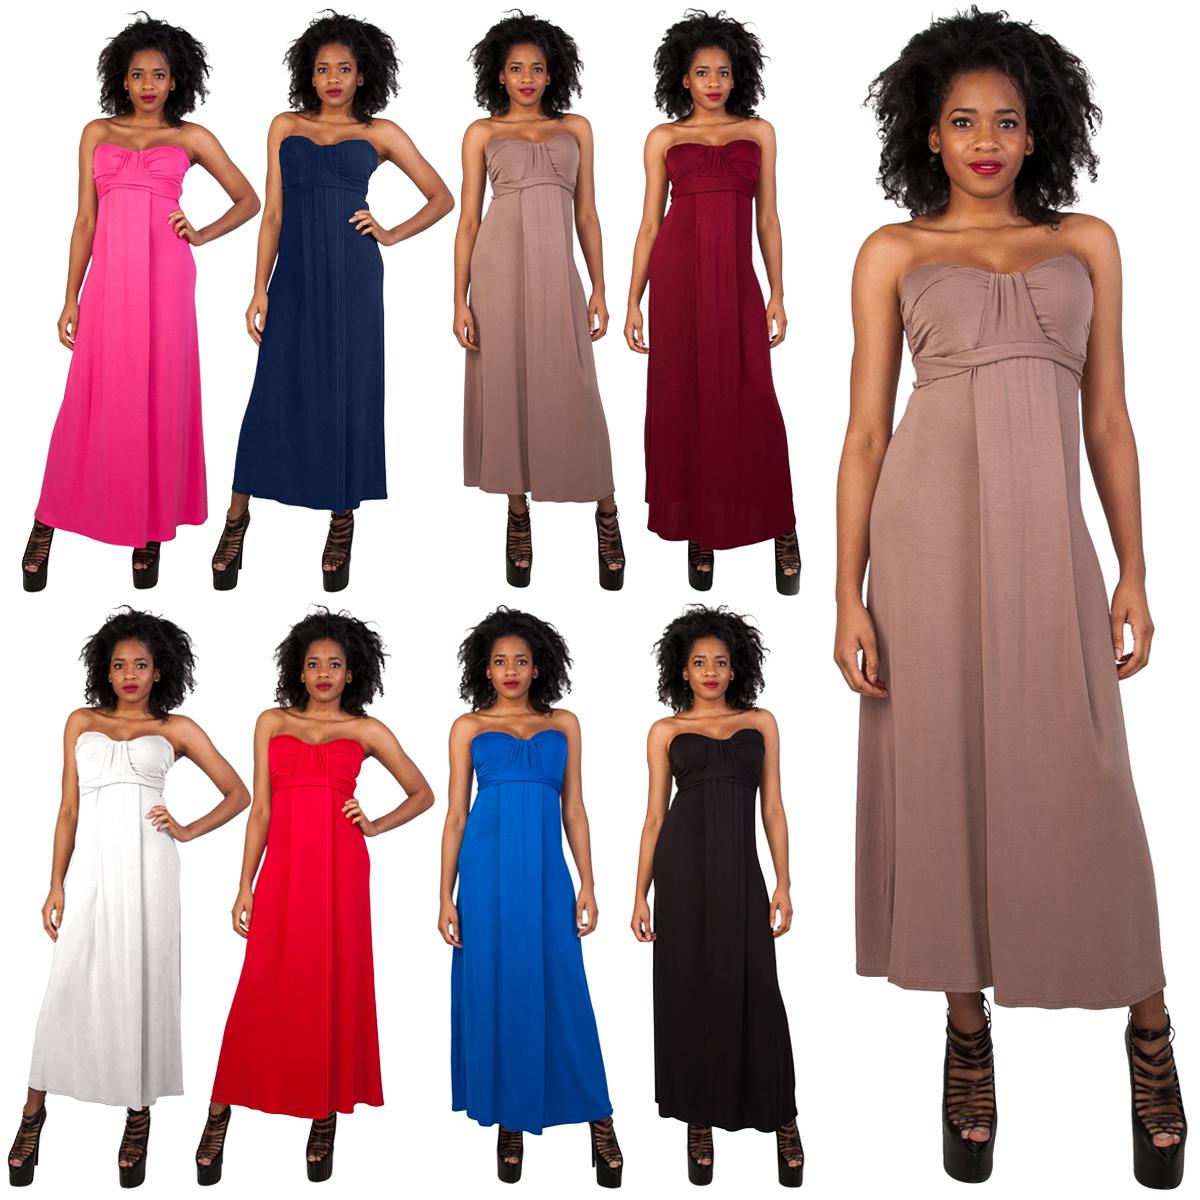 size 8 maxi dress strapless